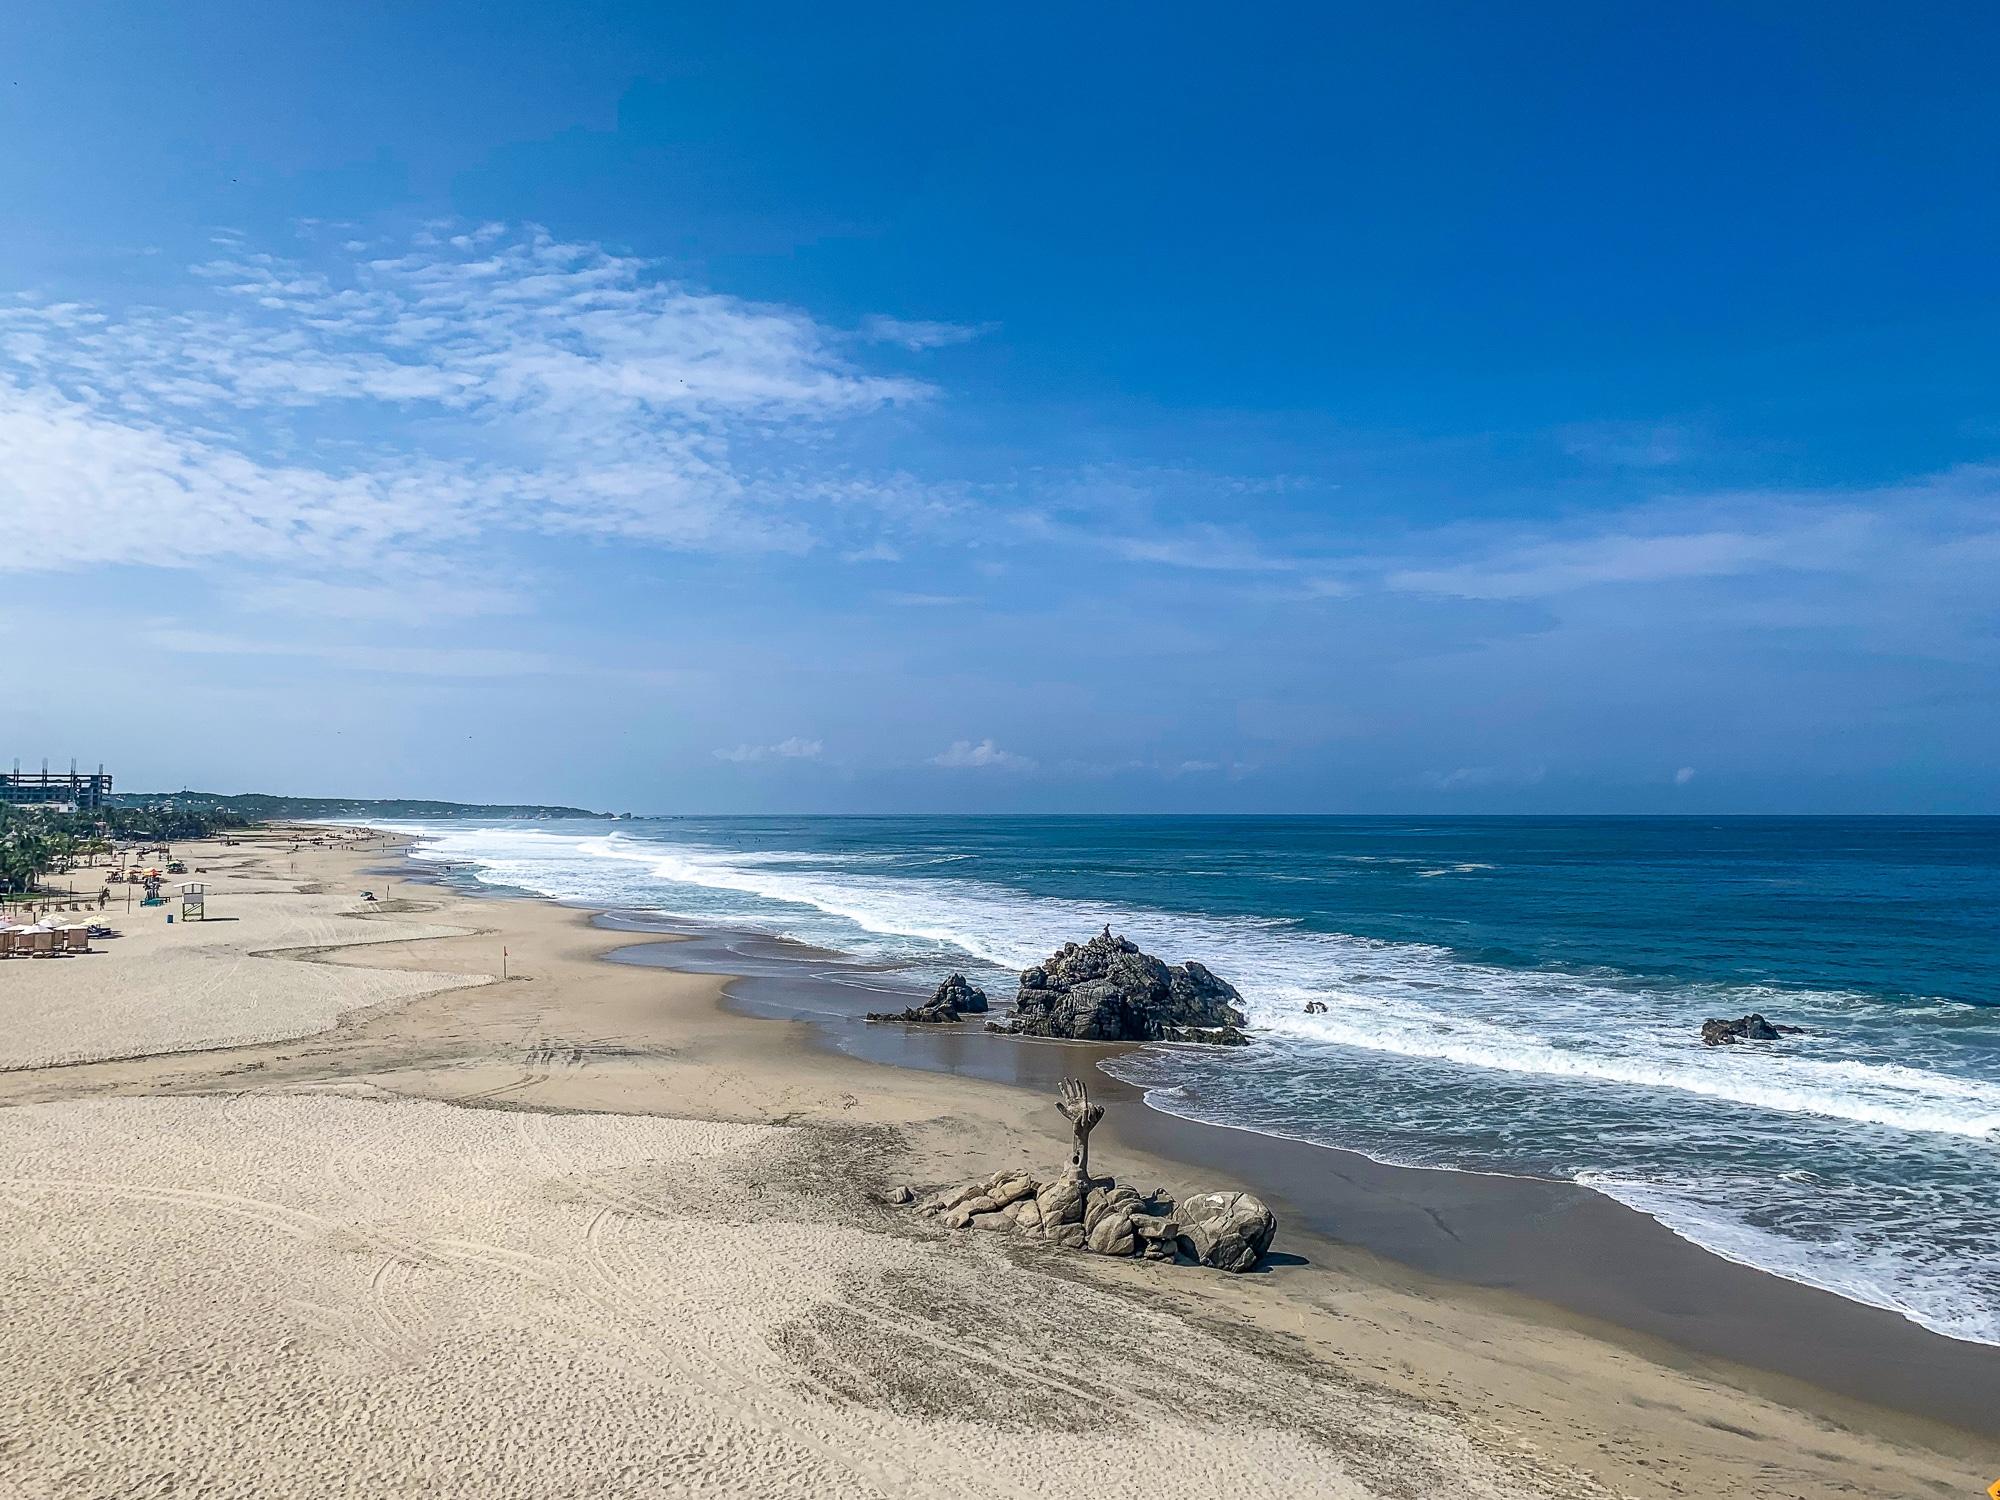 Puerto Escondido: Highlights, Erlebnisse und Ausflugsziele in Mexiko - Playa Zicatela